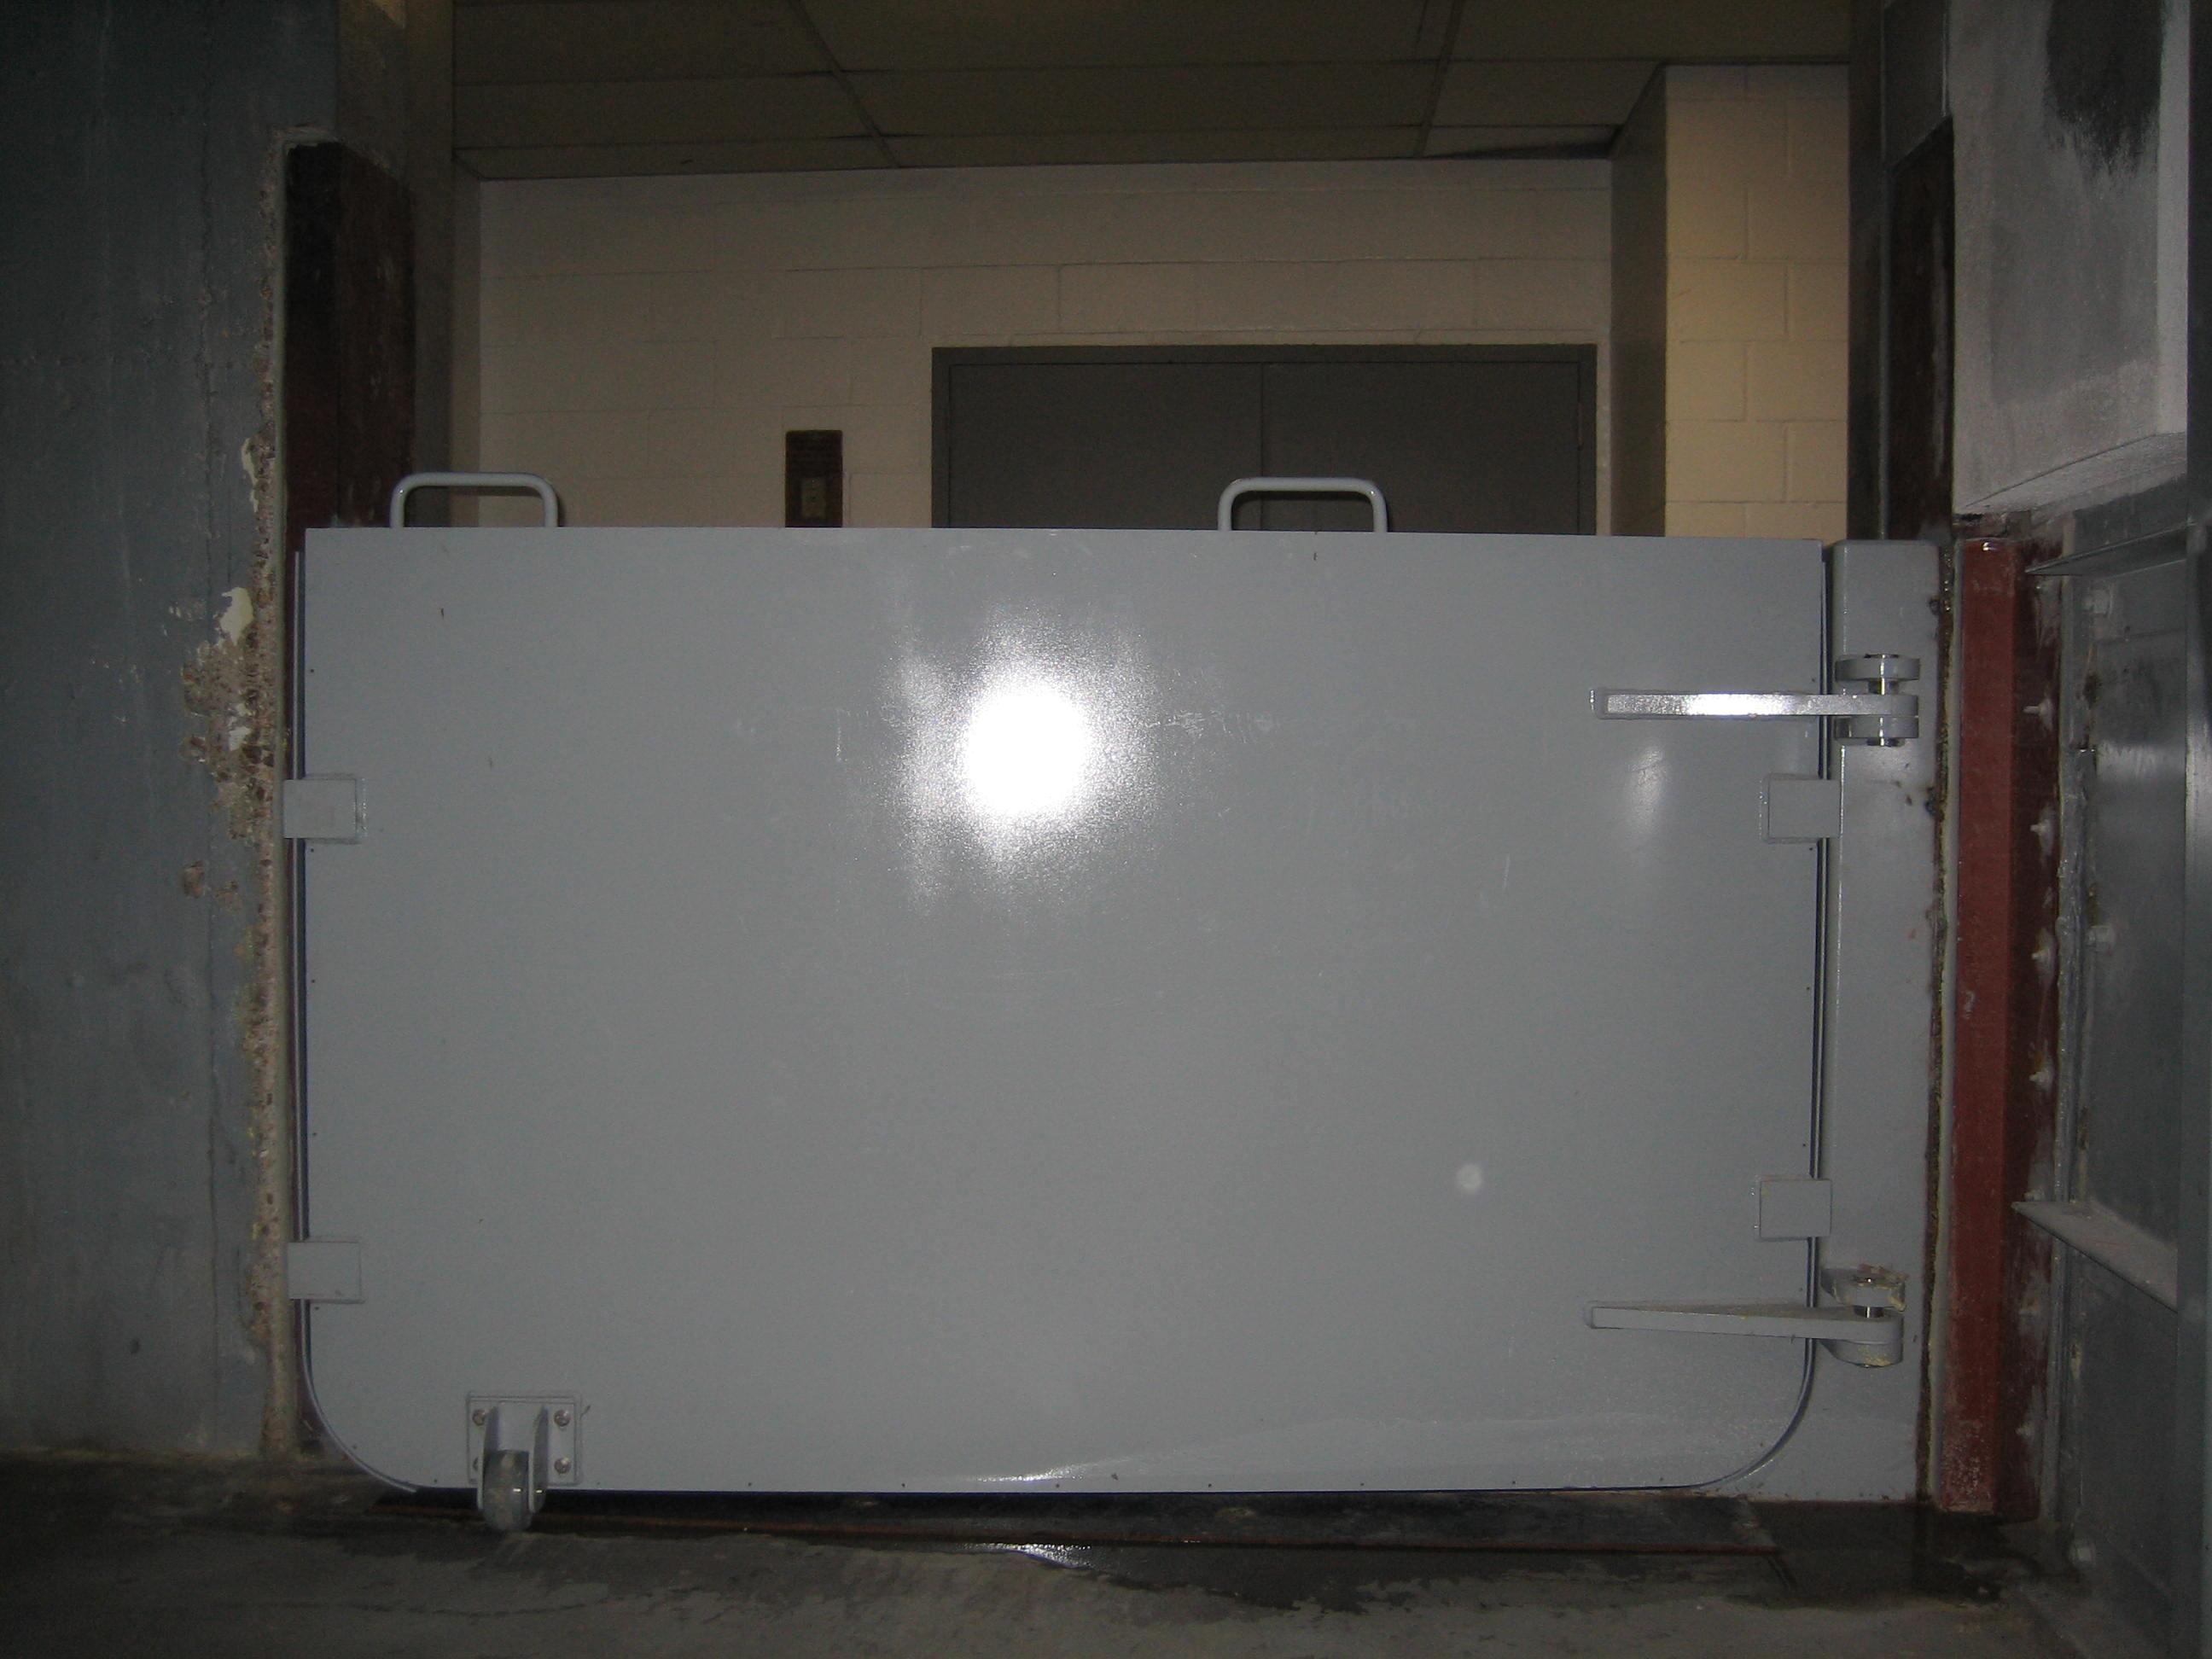 Wk Model Fg I Walz Amp Krenzer Inc